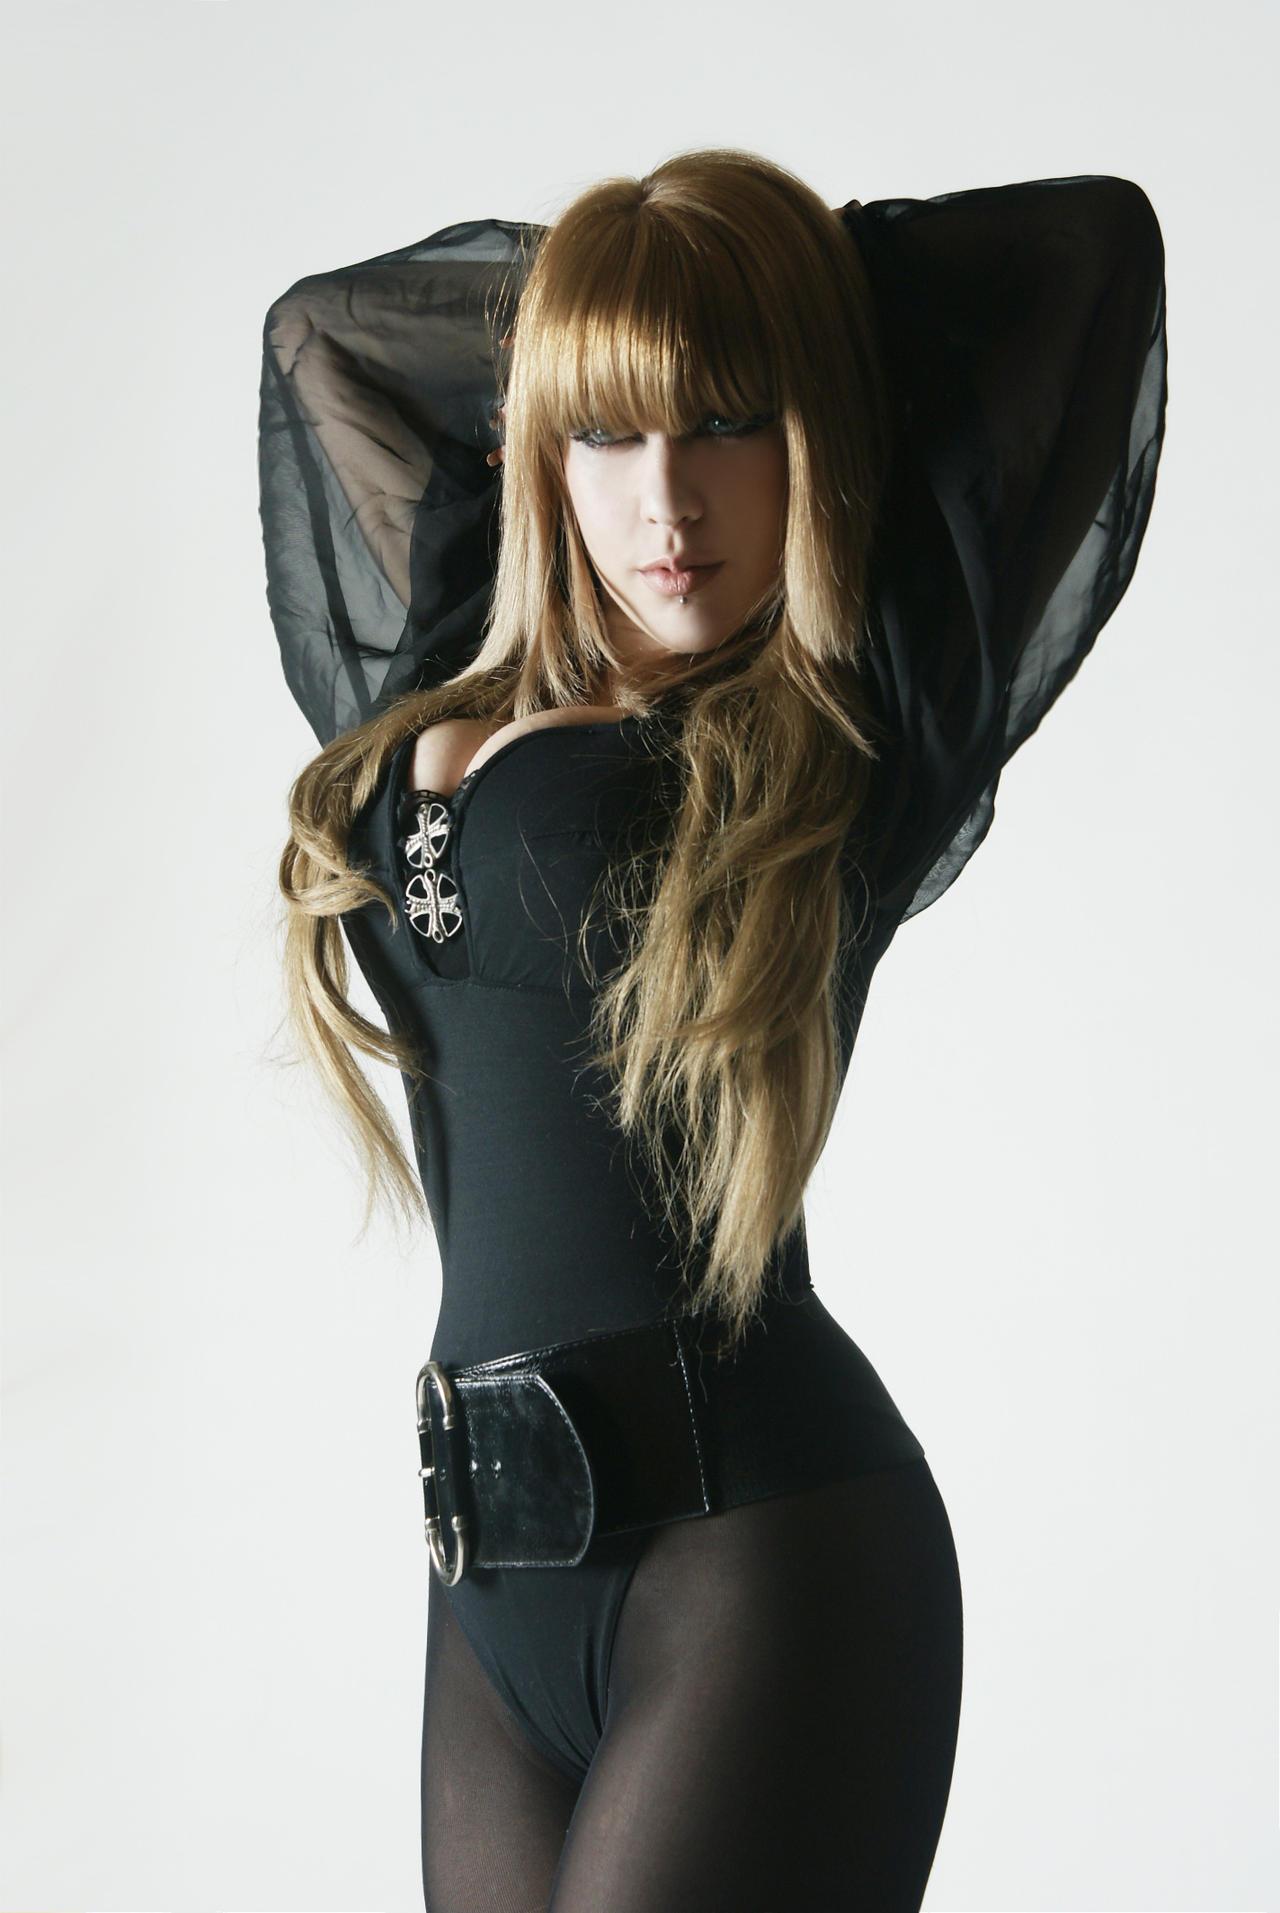 Tanit-Isis Black Bodysuit II by tanit-isis-stock